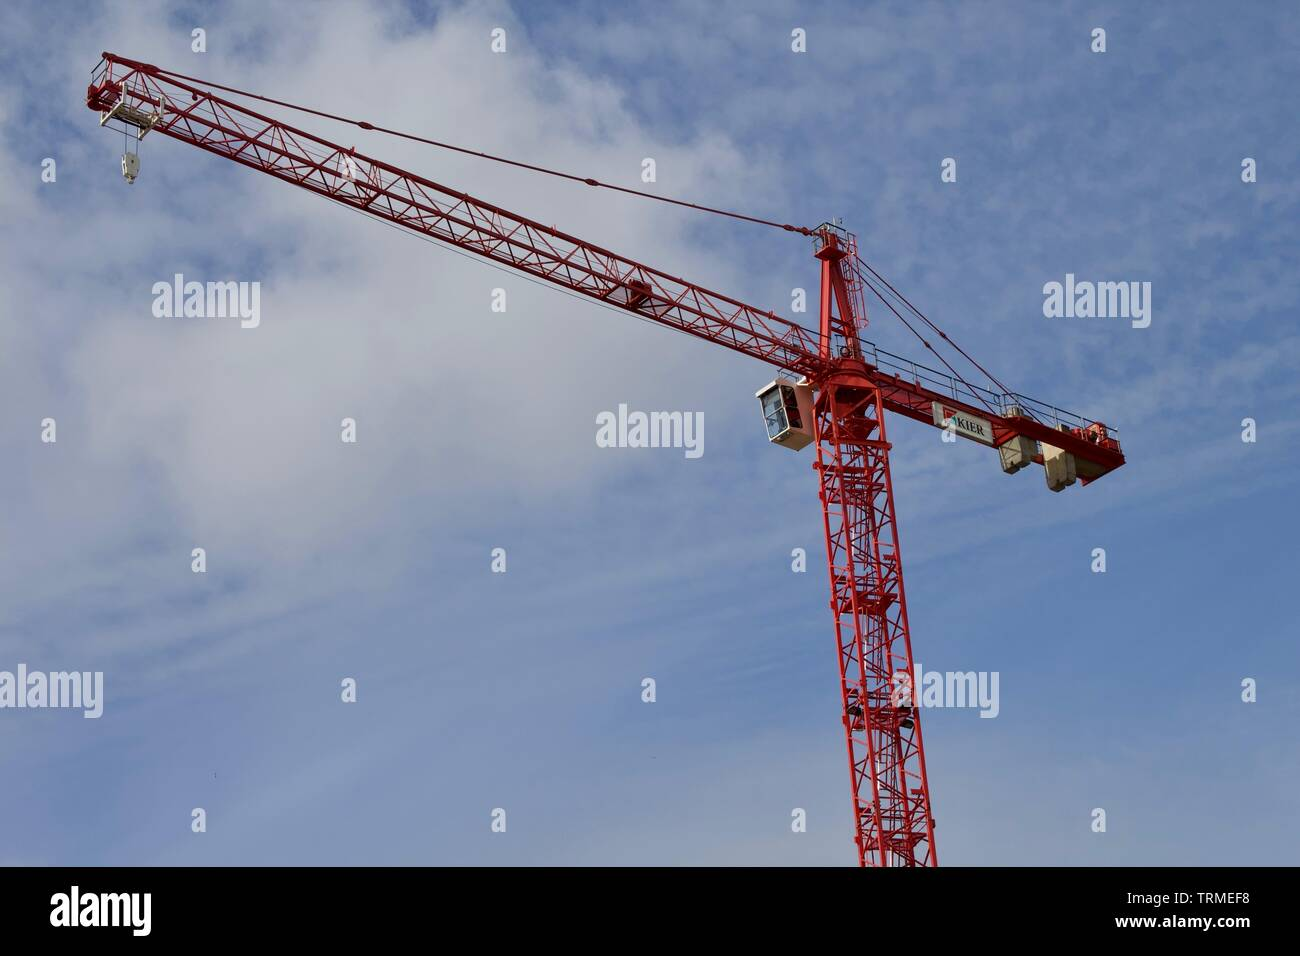 Stationary Tower Cranes in Bristol, Photo taken in Bristol. - Stock Image